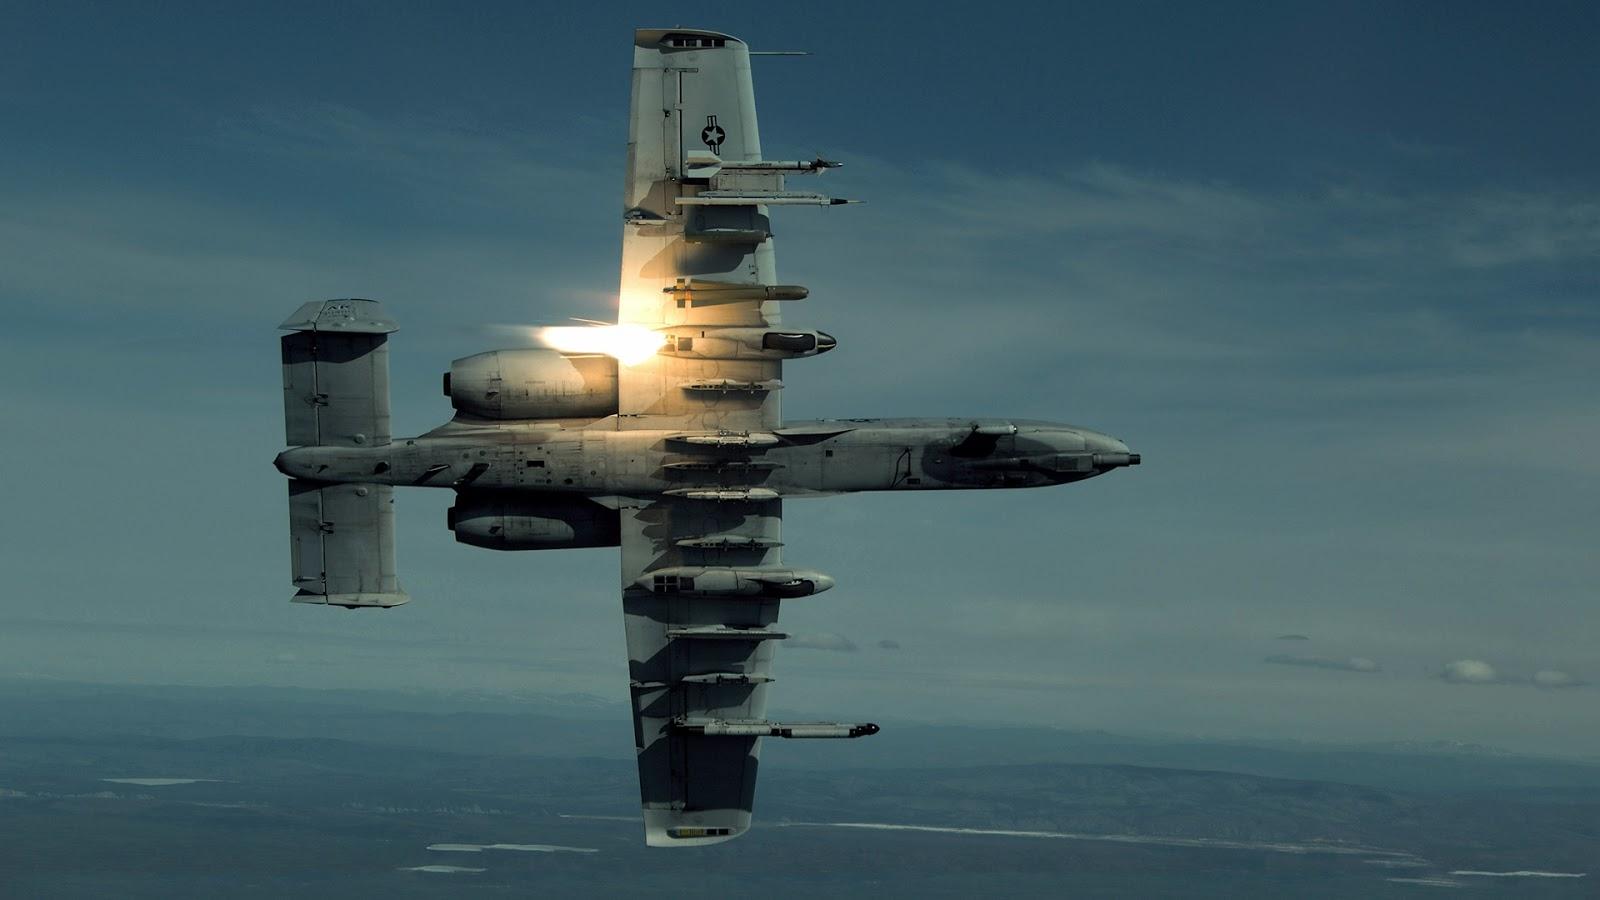 A10 Jet Plane | Full HD Desktop Wallpapers 1080p